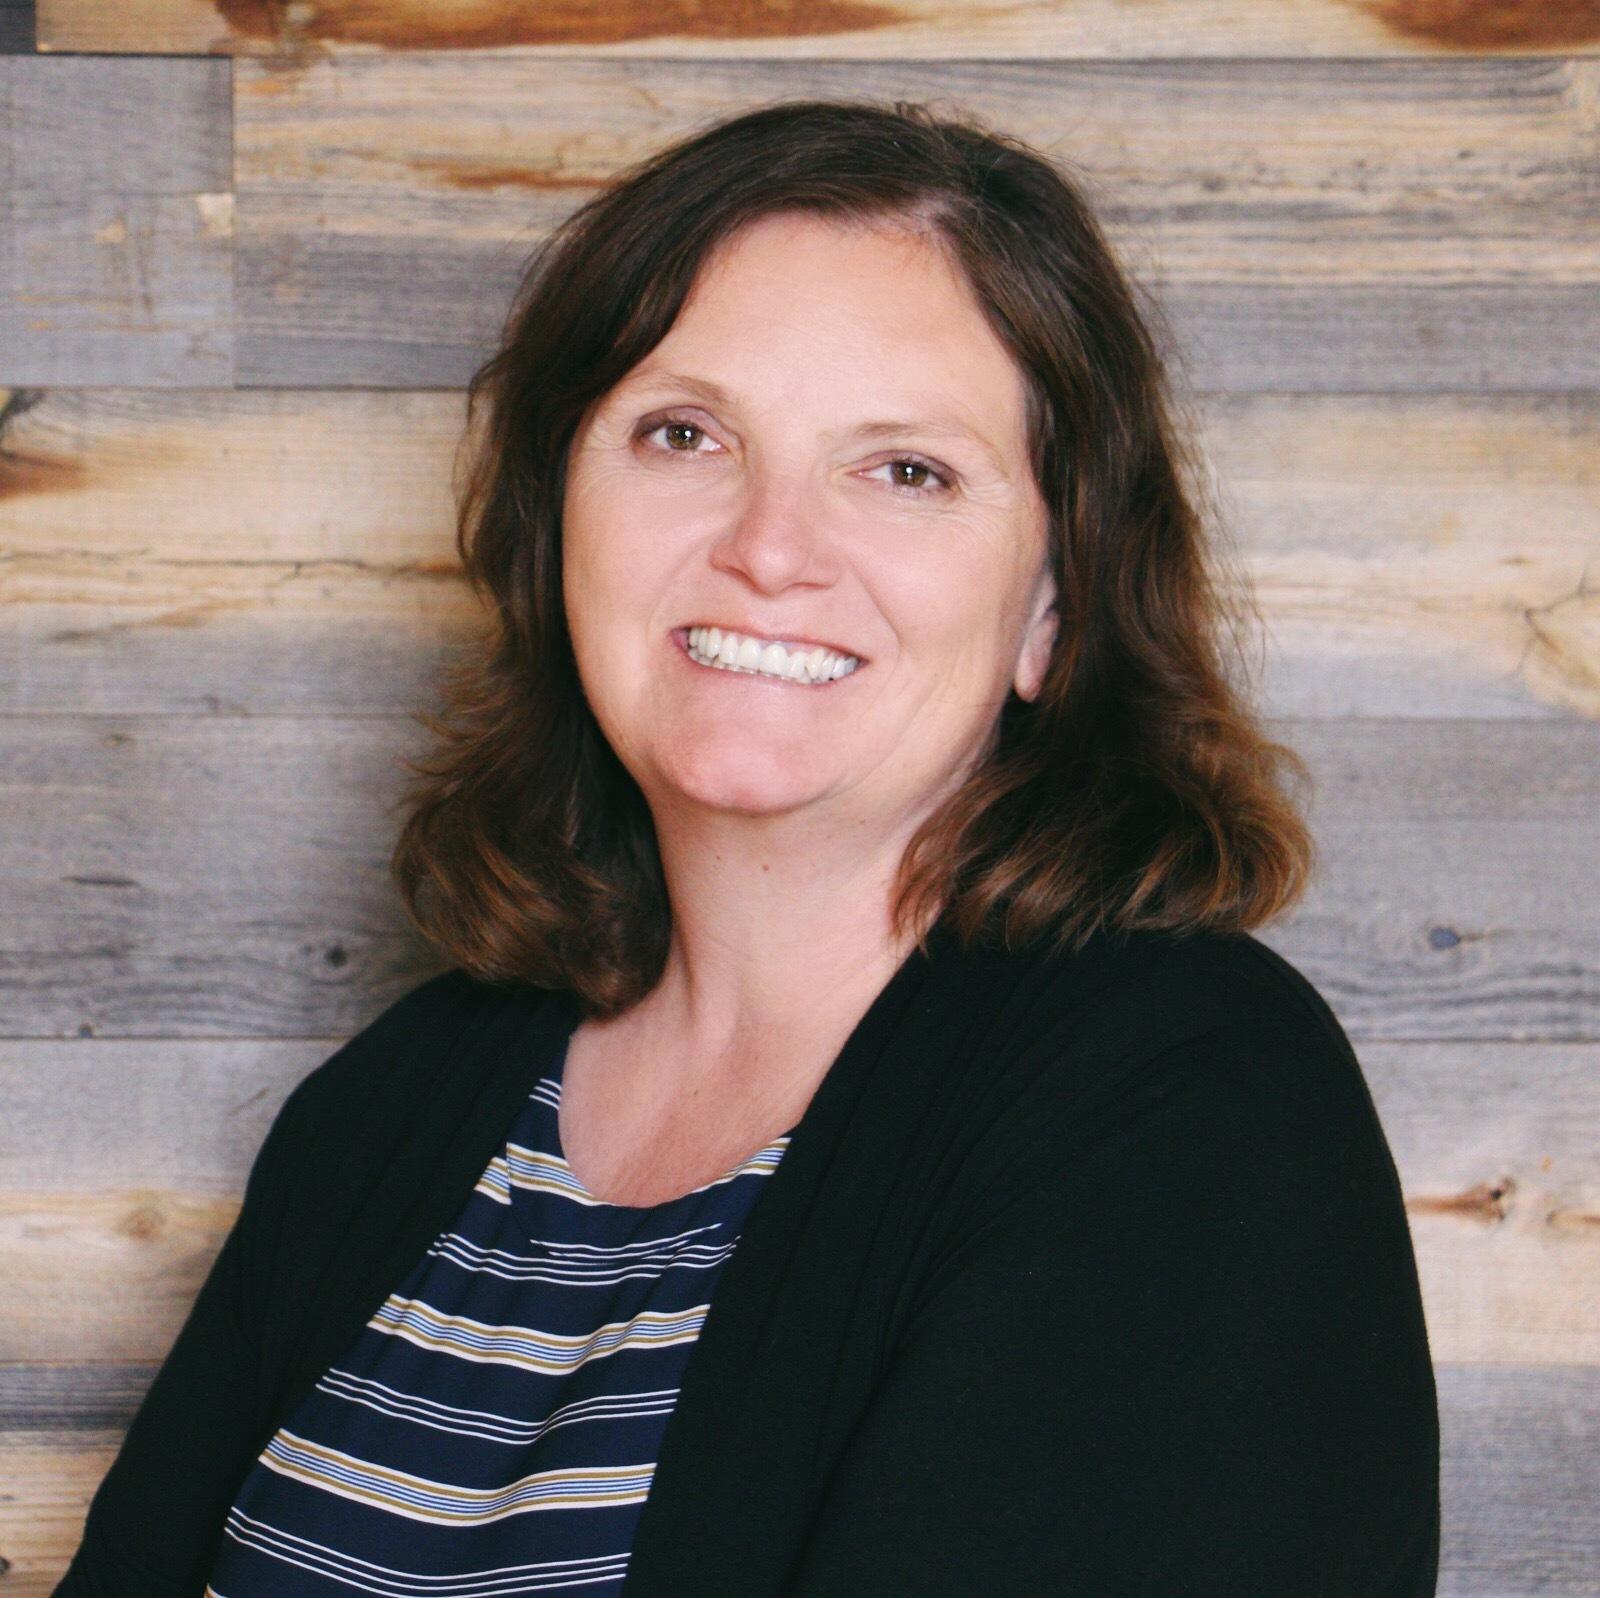 CEO Kim Lawton's MediaPost Column on Consumer Mindsets